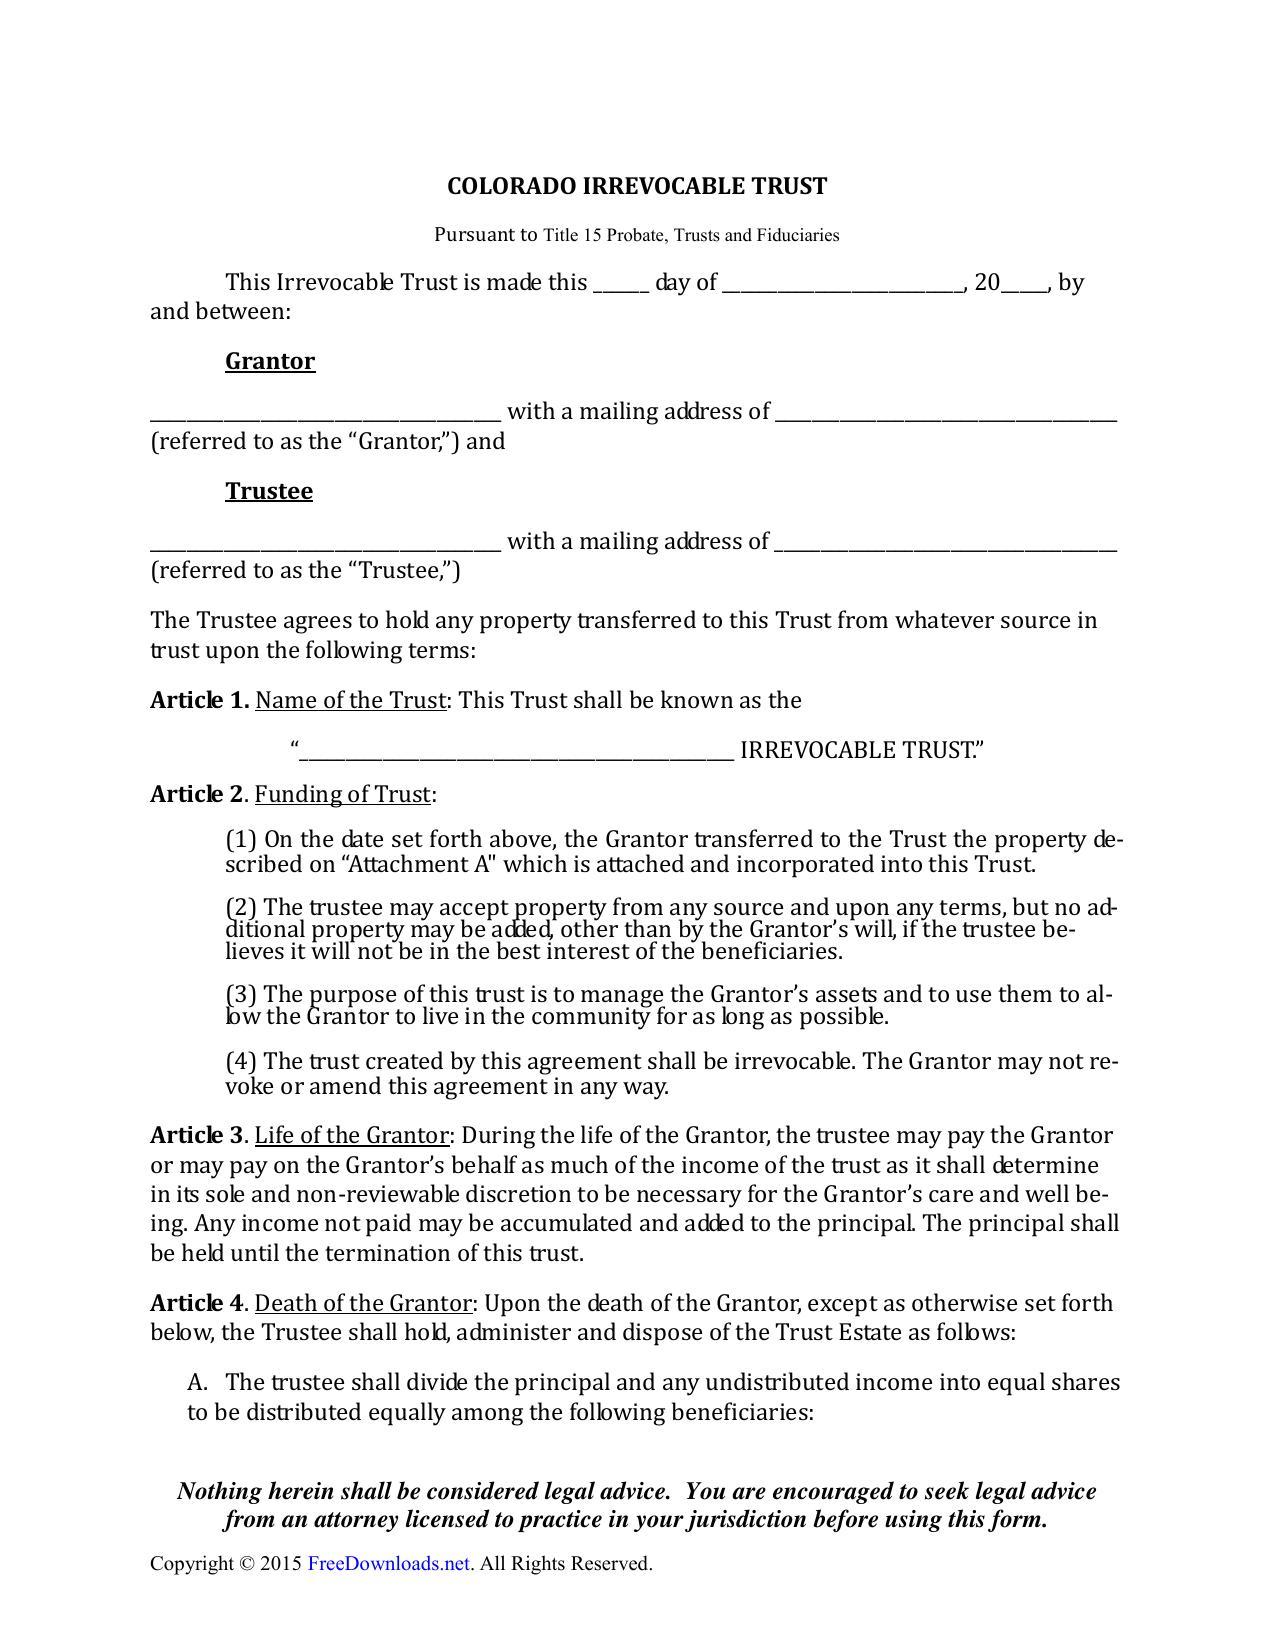 Irrevocable Trust Form Colorado